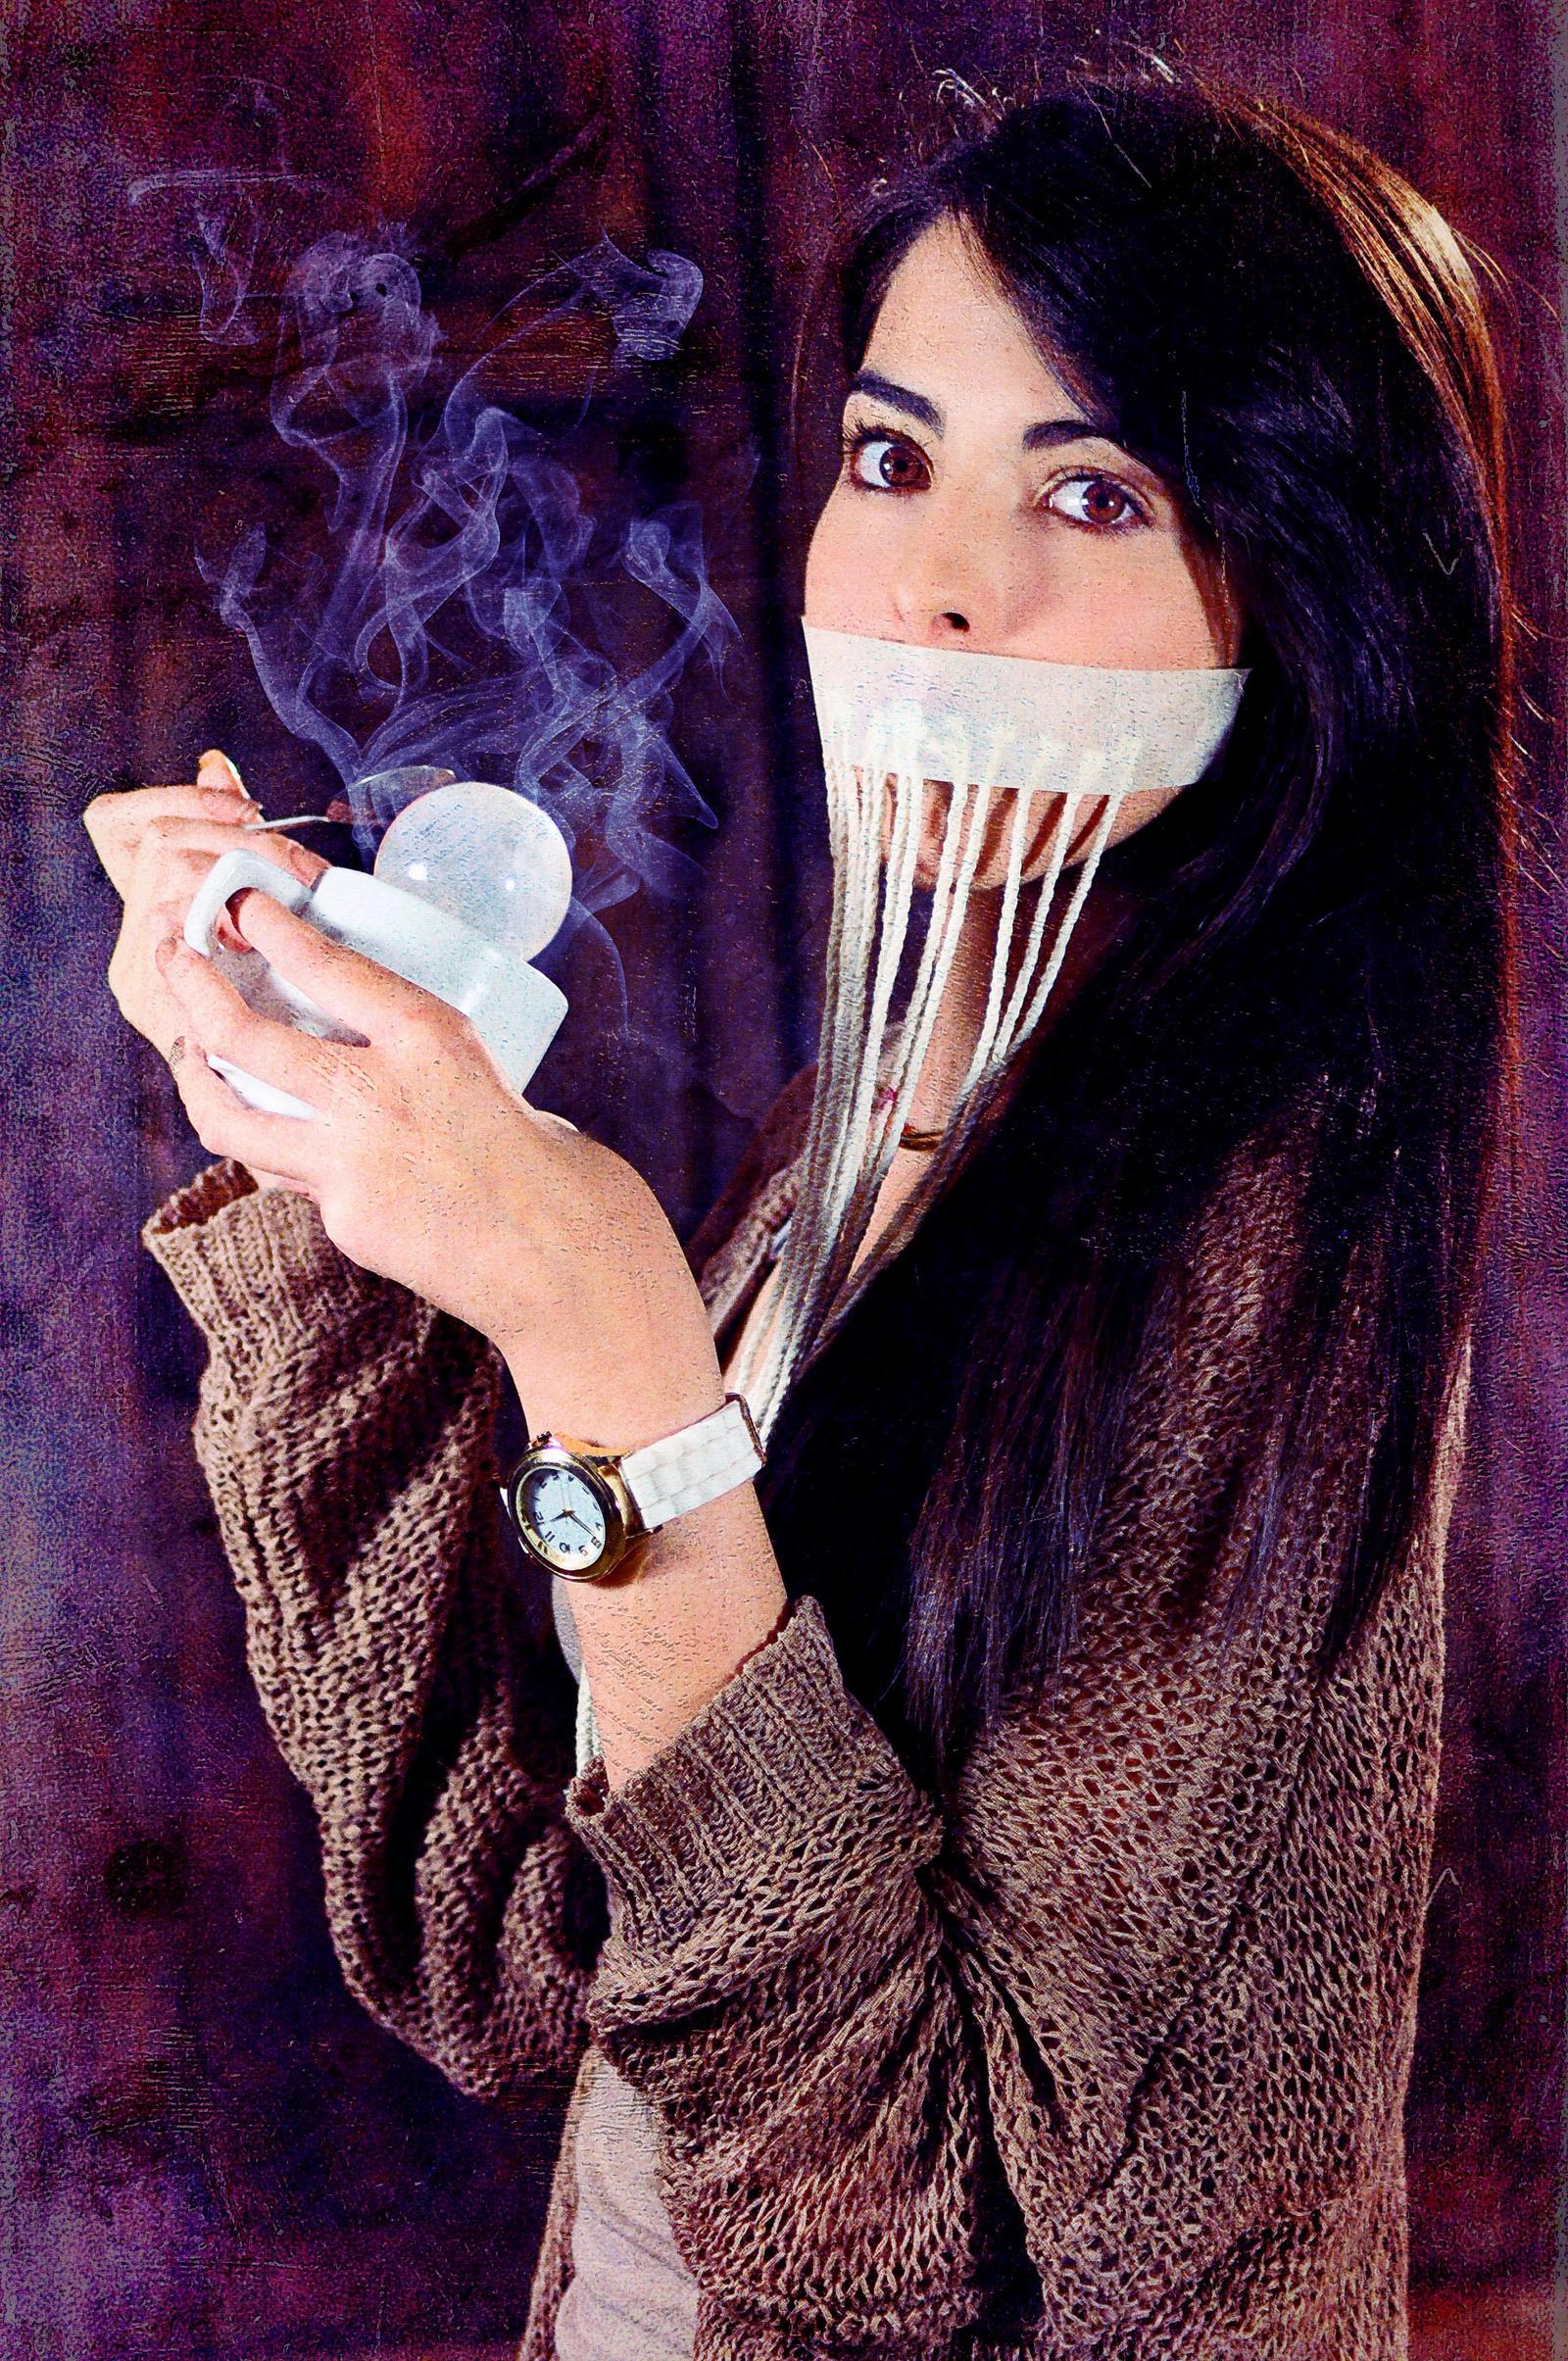 Drinking Light Tea by BENAFOG